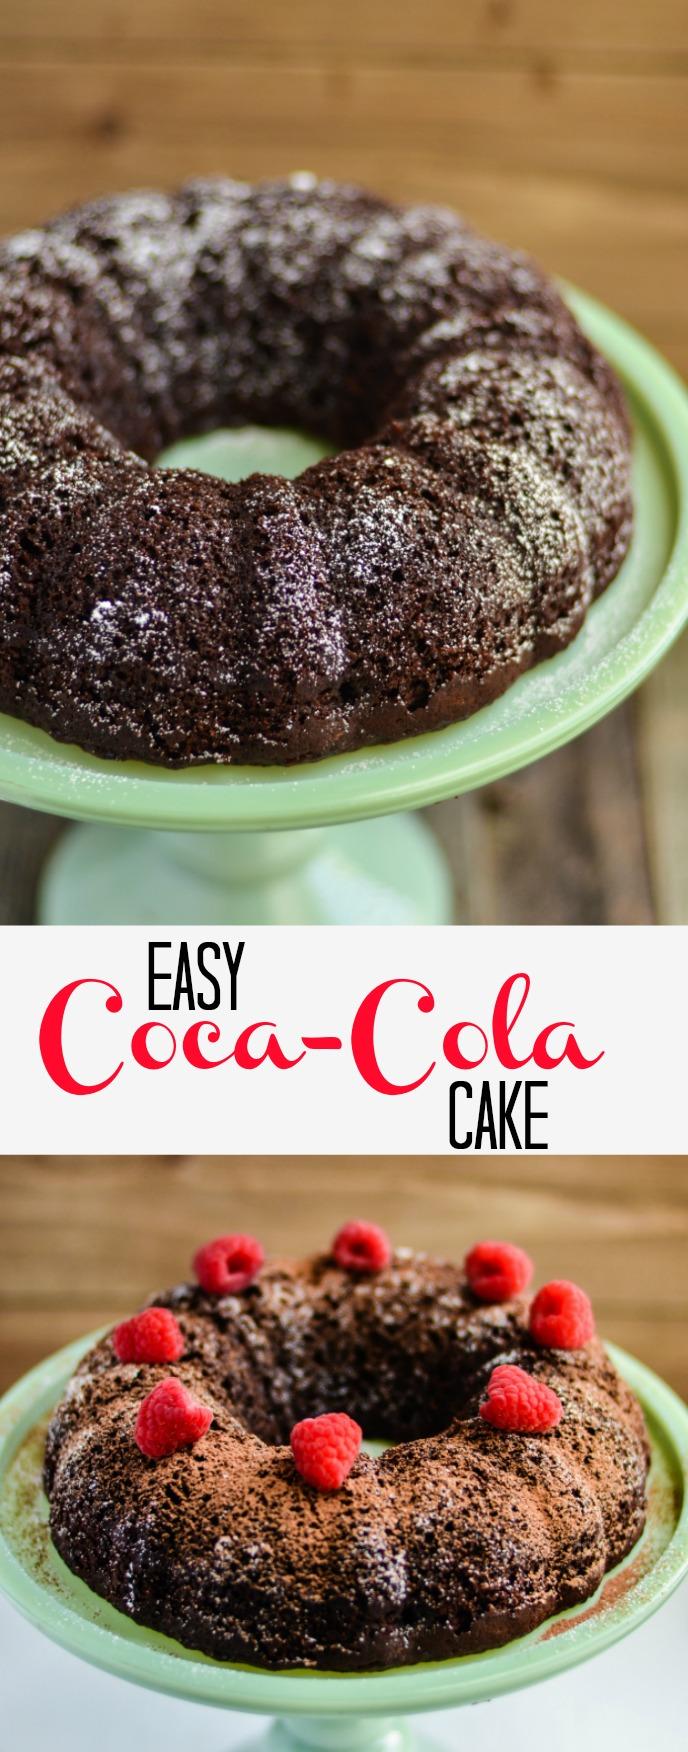 easy coca cola cake